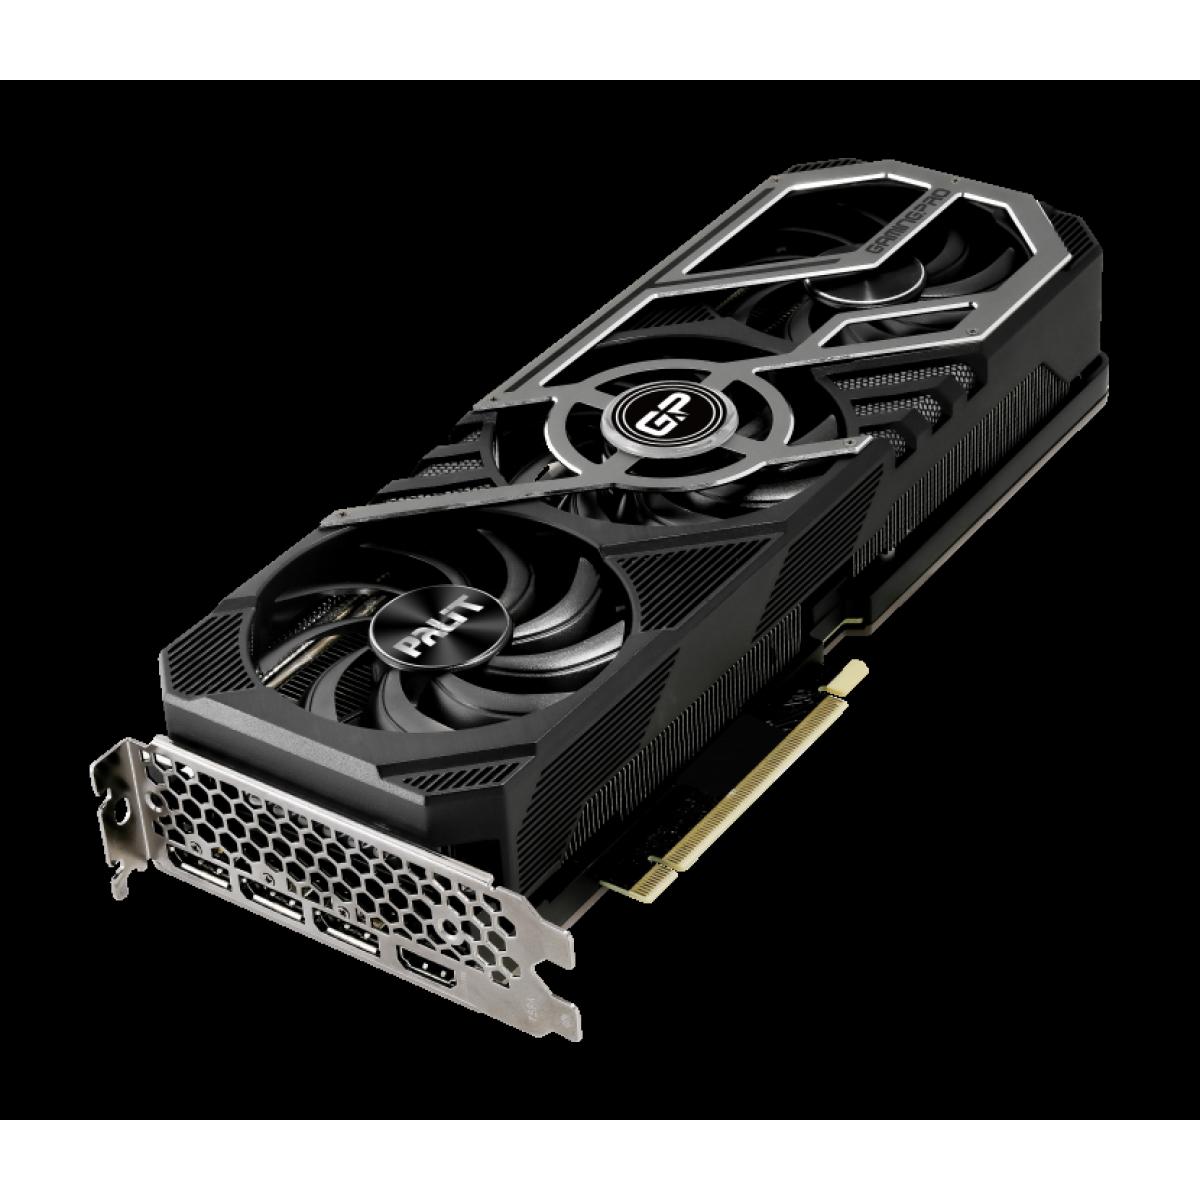 Placa de Vídeo Palit NVIDIA GeForce RTX 3070 GamingPro OC, 8GB, GDDR6, 256bit, NE63070S19P2-1041A